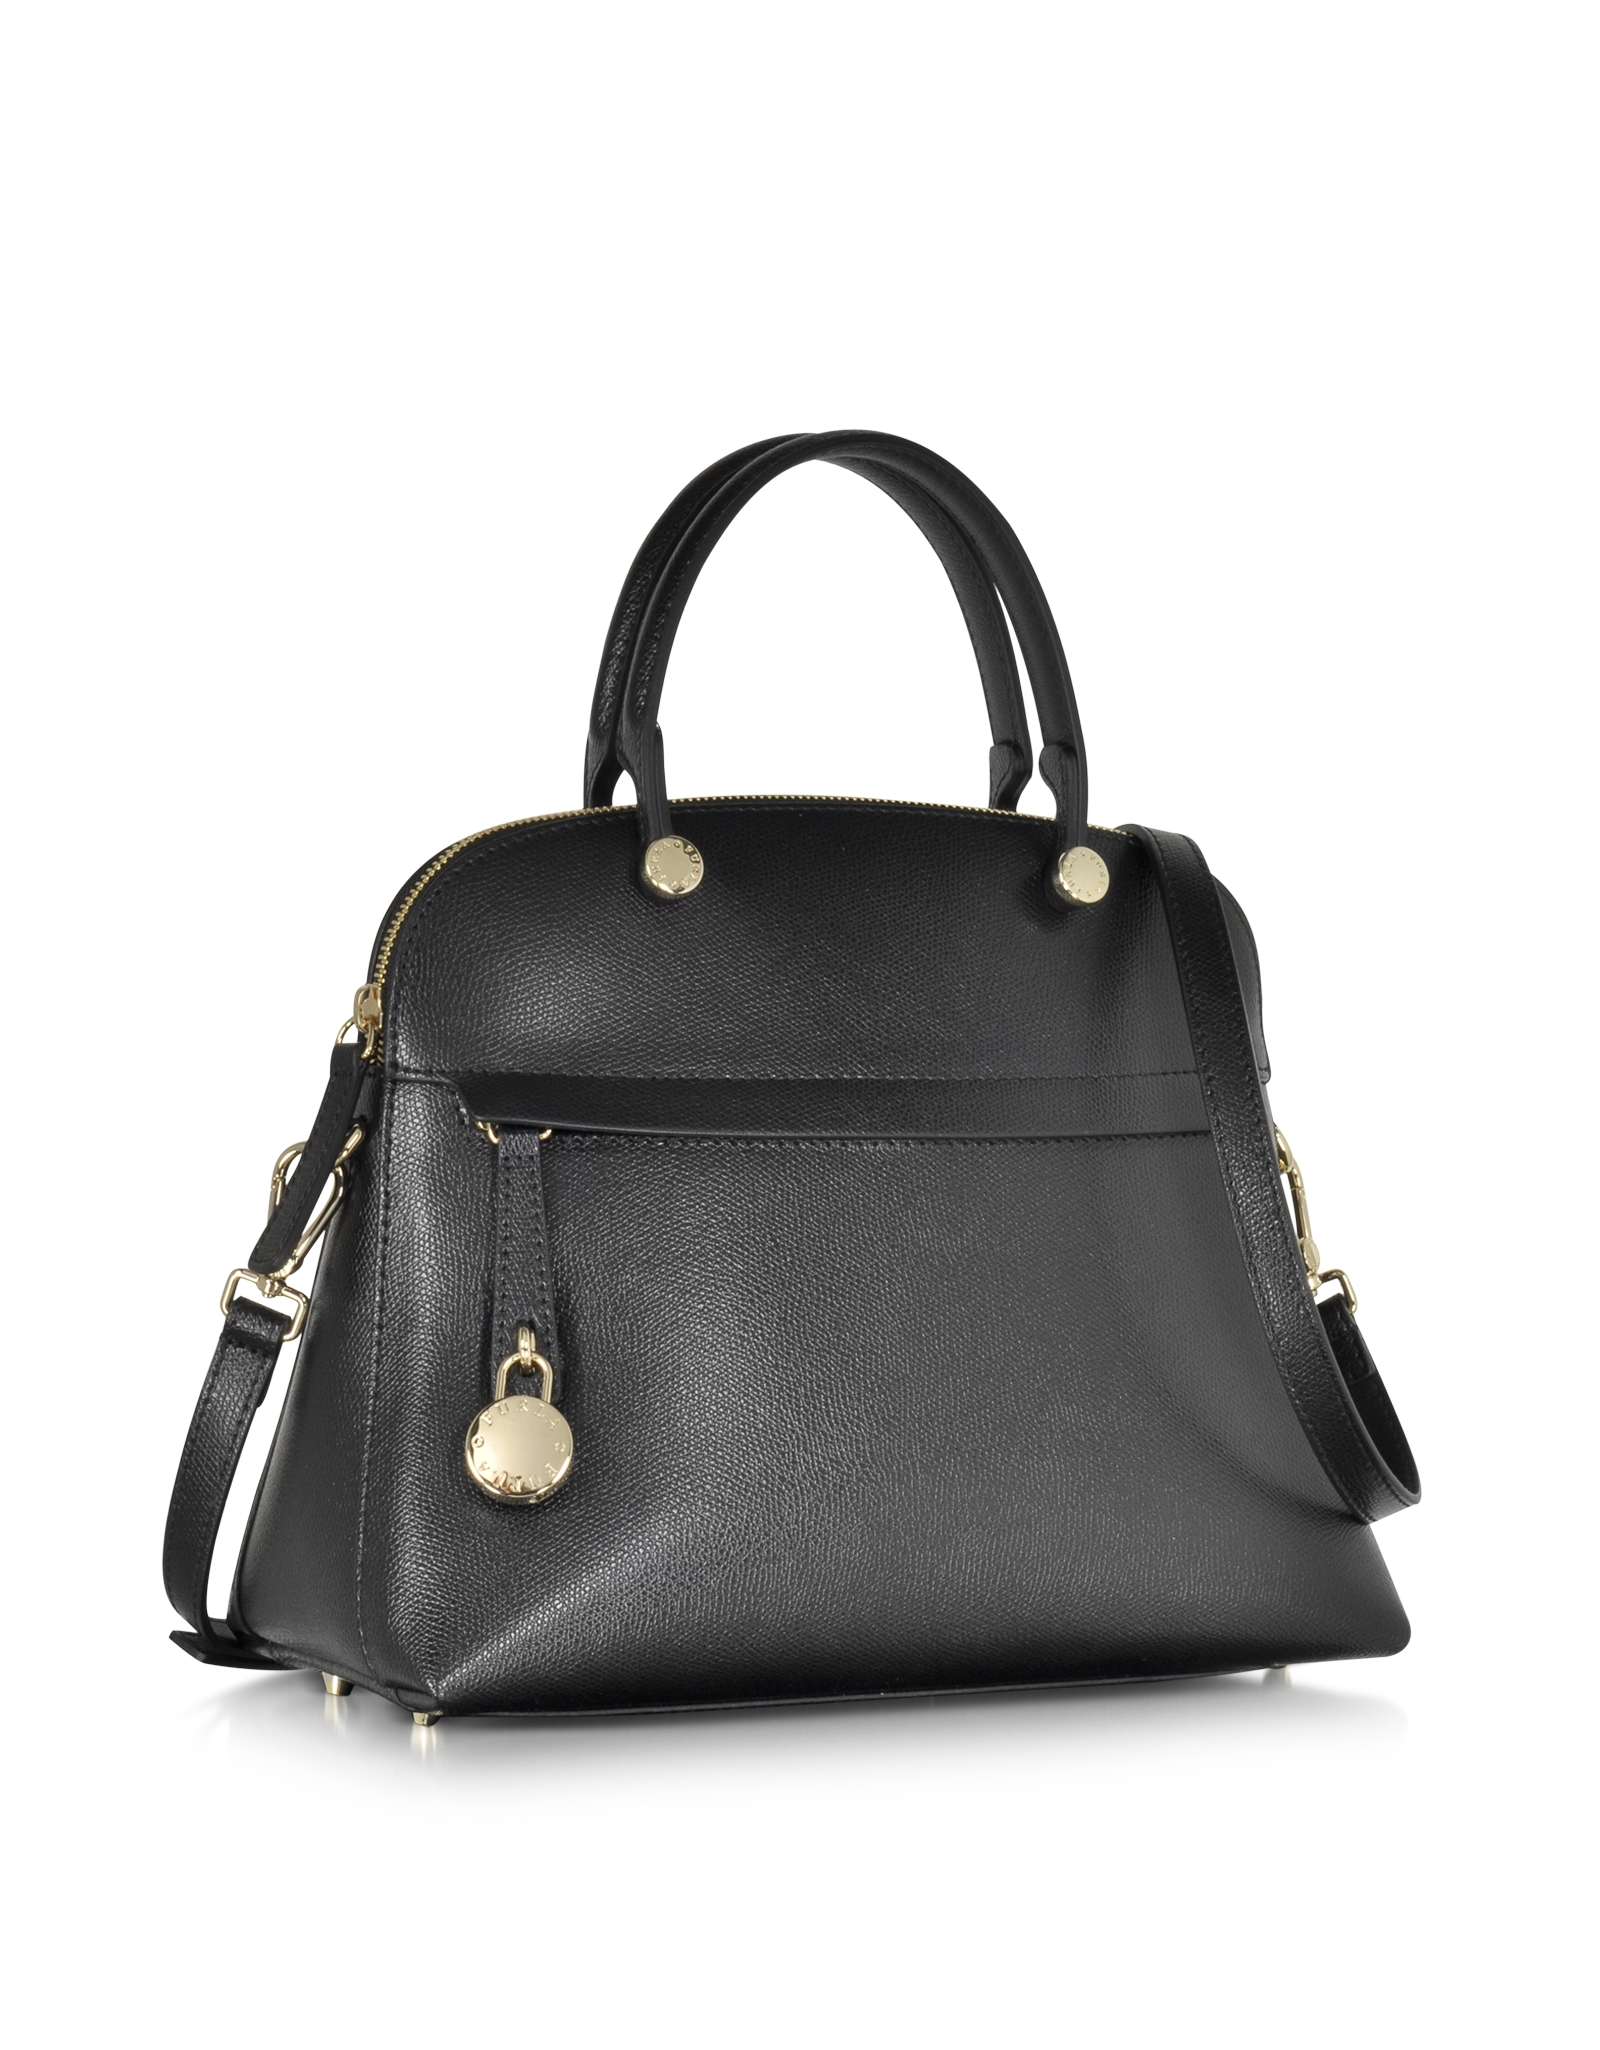 40dd553e745a Black Furla Handbag - Foto Handbag All Collections Salonagafiya.Com